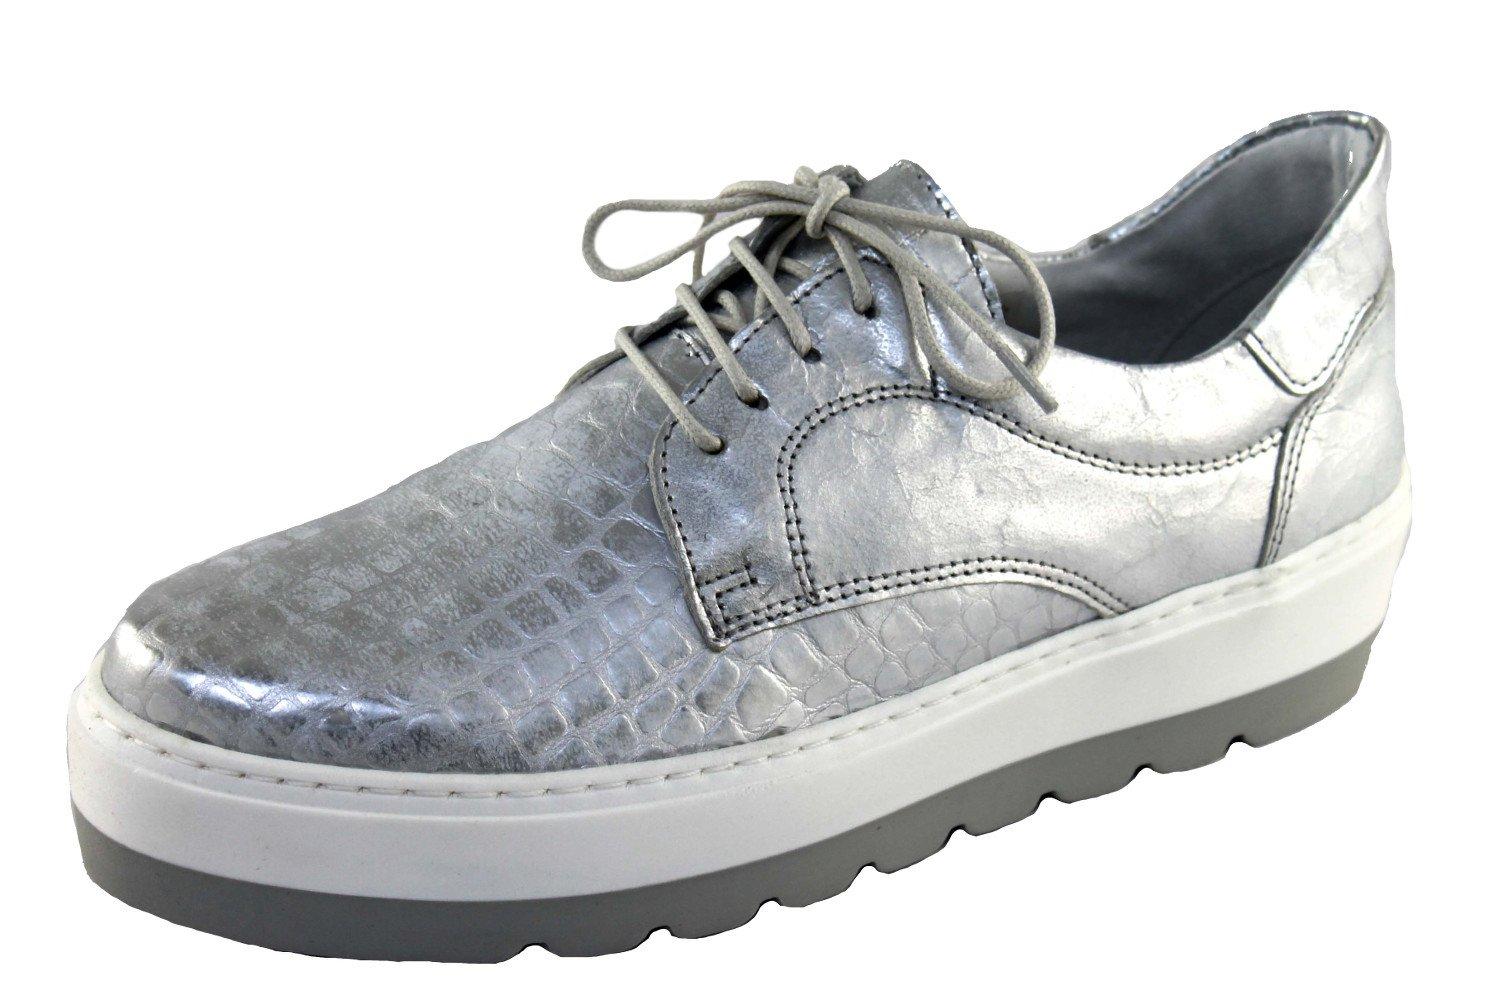 Post XchangeMandy - zapatos de tacón Mujer 39 EU|plata